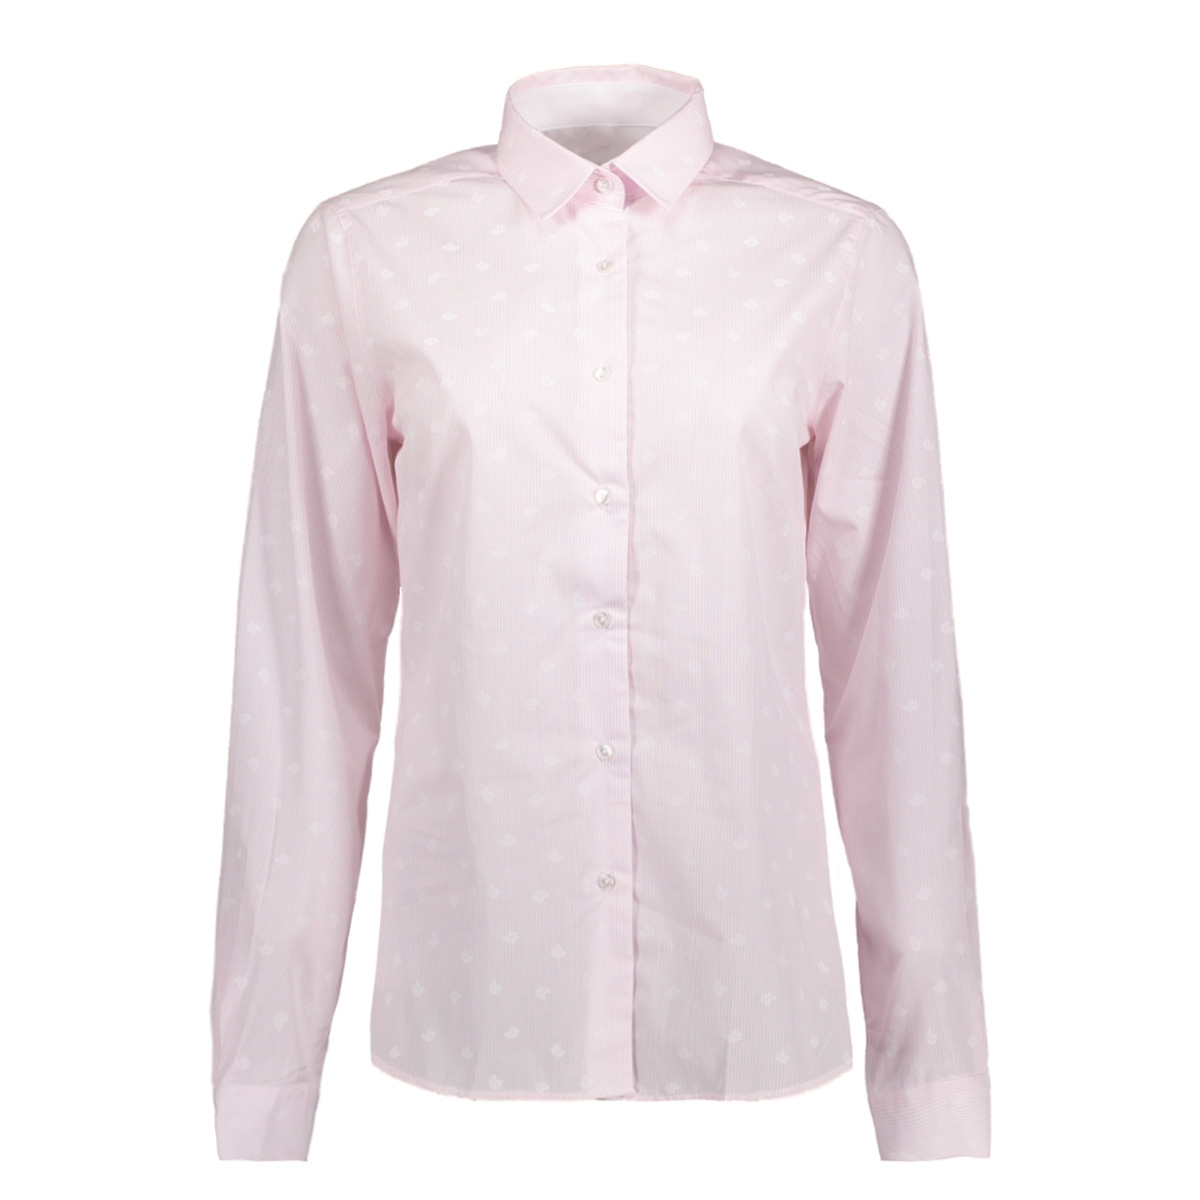 99-4120-063-2 milano blouse 401